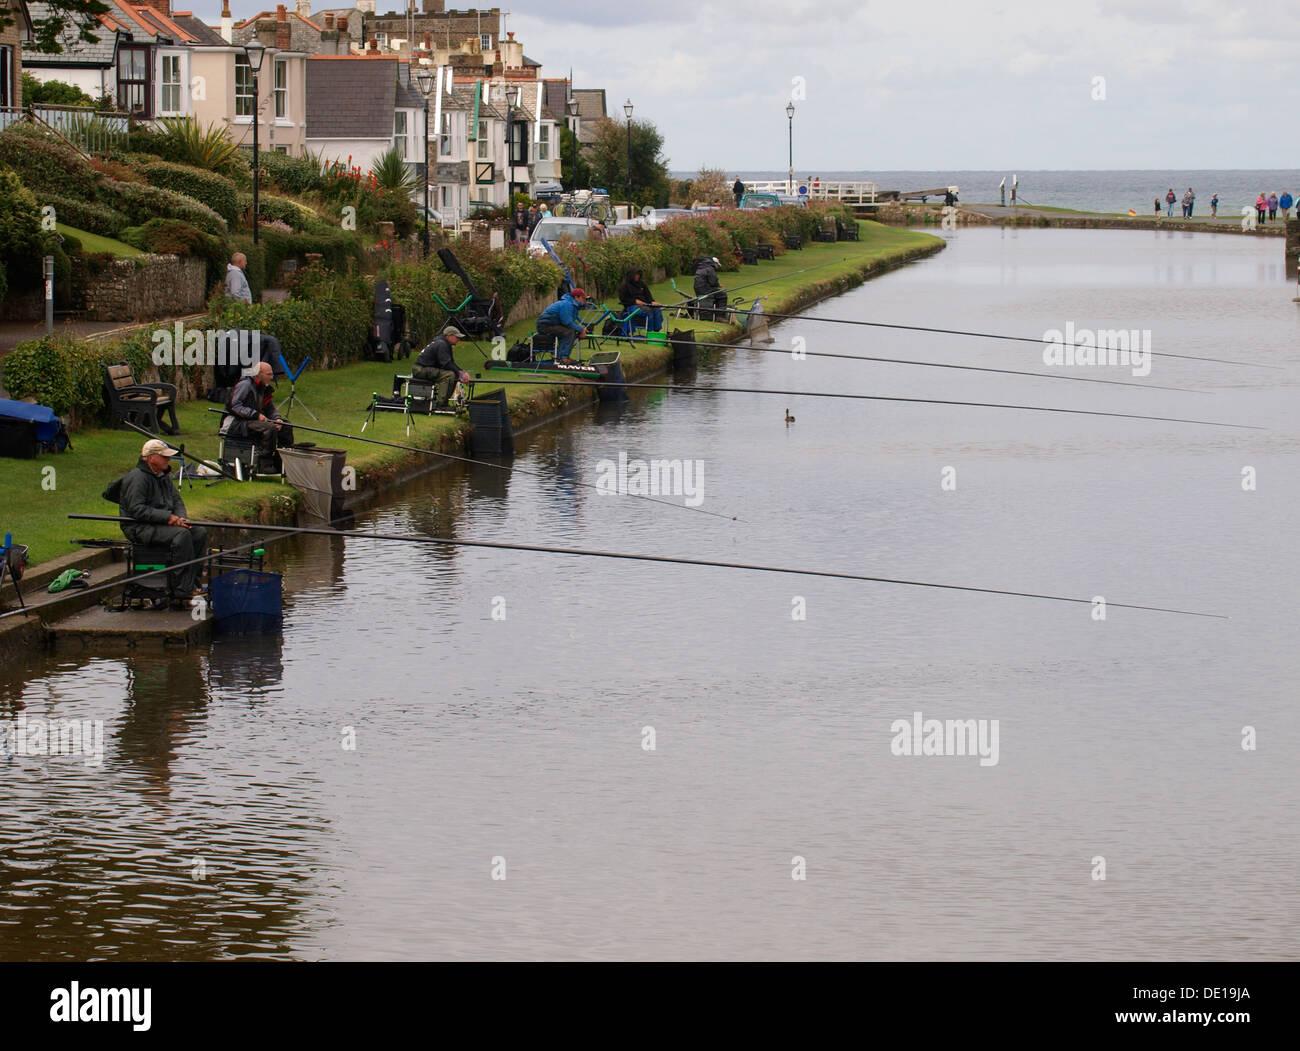 Fishing match on the Bude Canal, Cornwall, UK 2013 - Stock Image